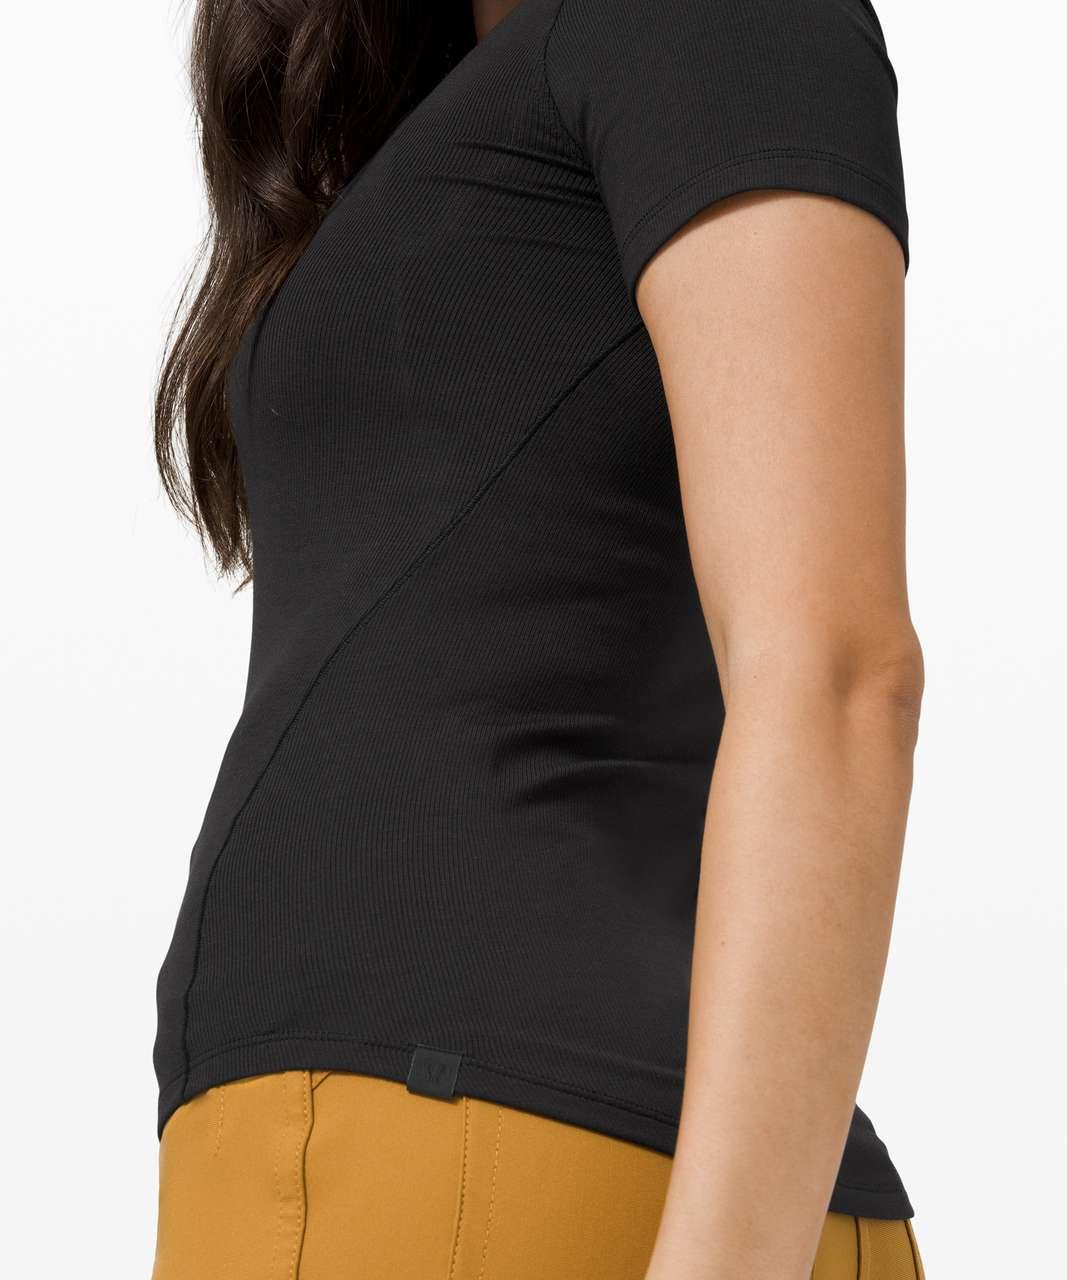 Lululemon Hold Tight Short Sleeve - Black